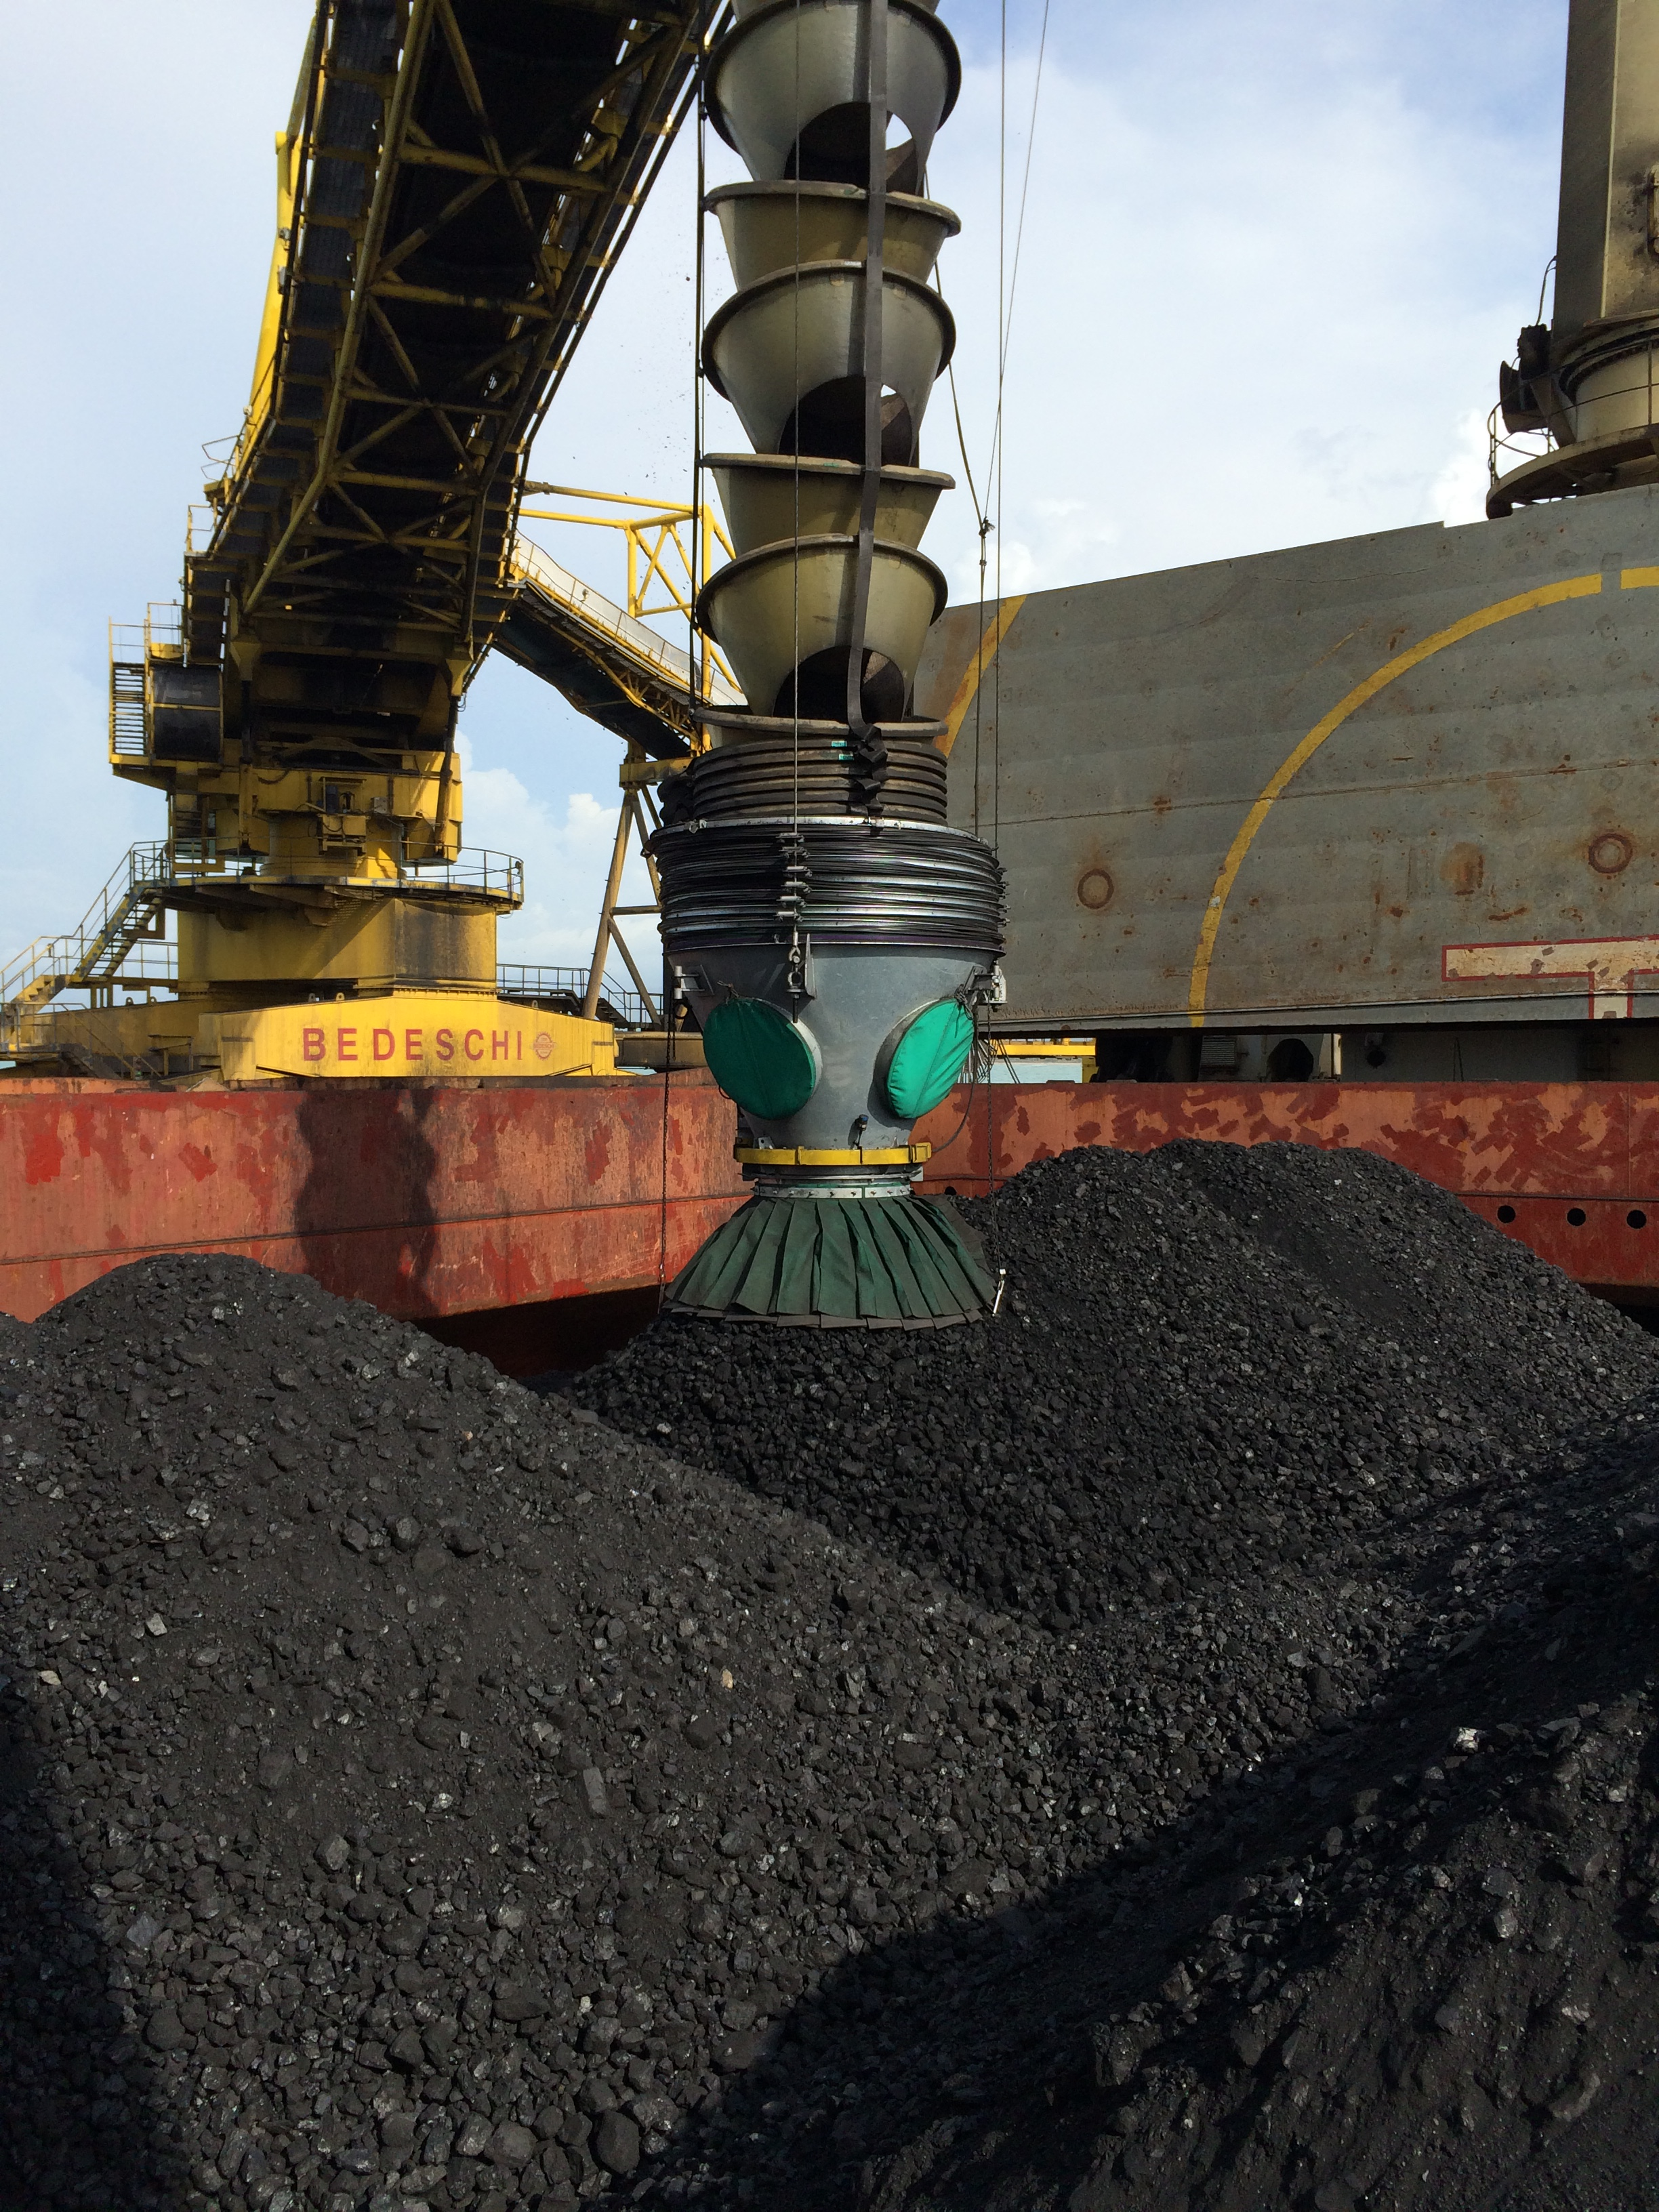 Cleveland Cascades Install Coal Loading Chute at Puerto